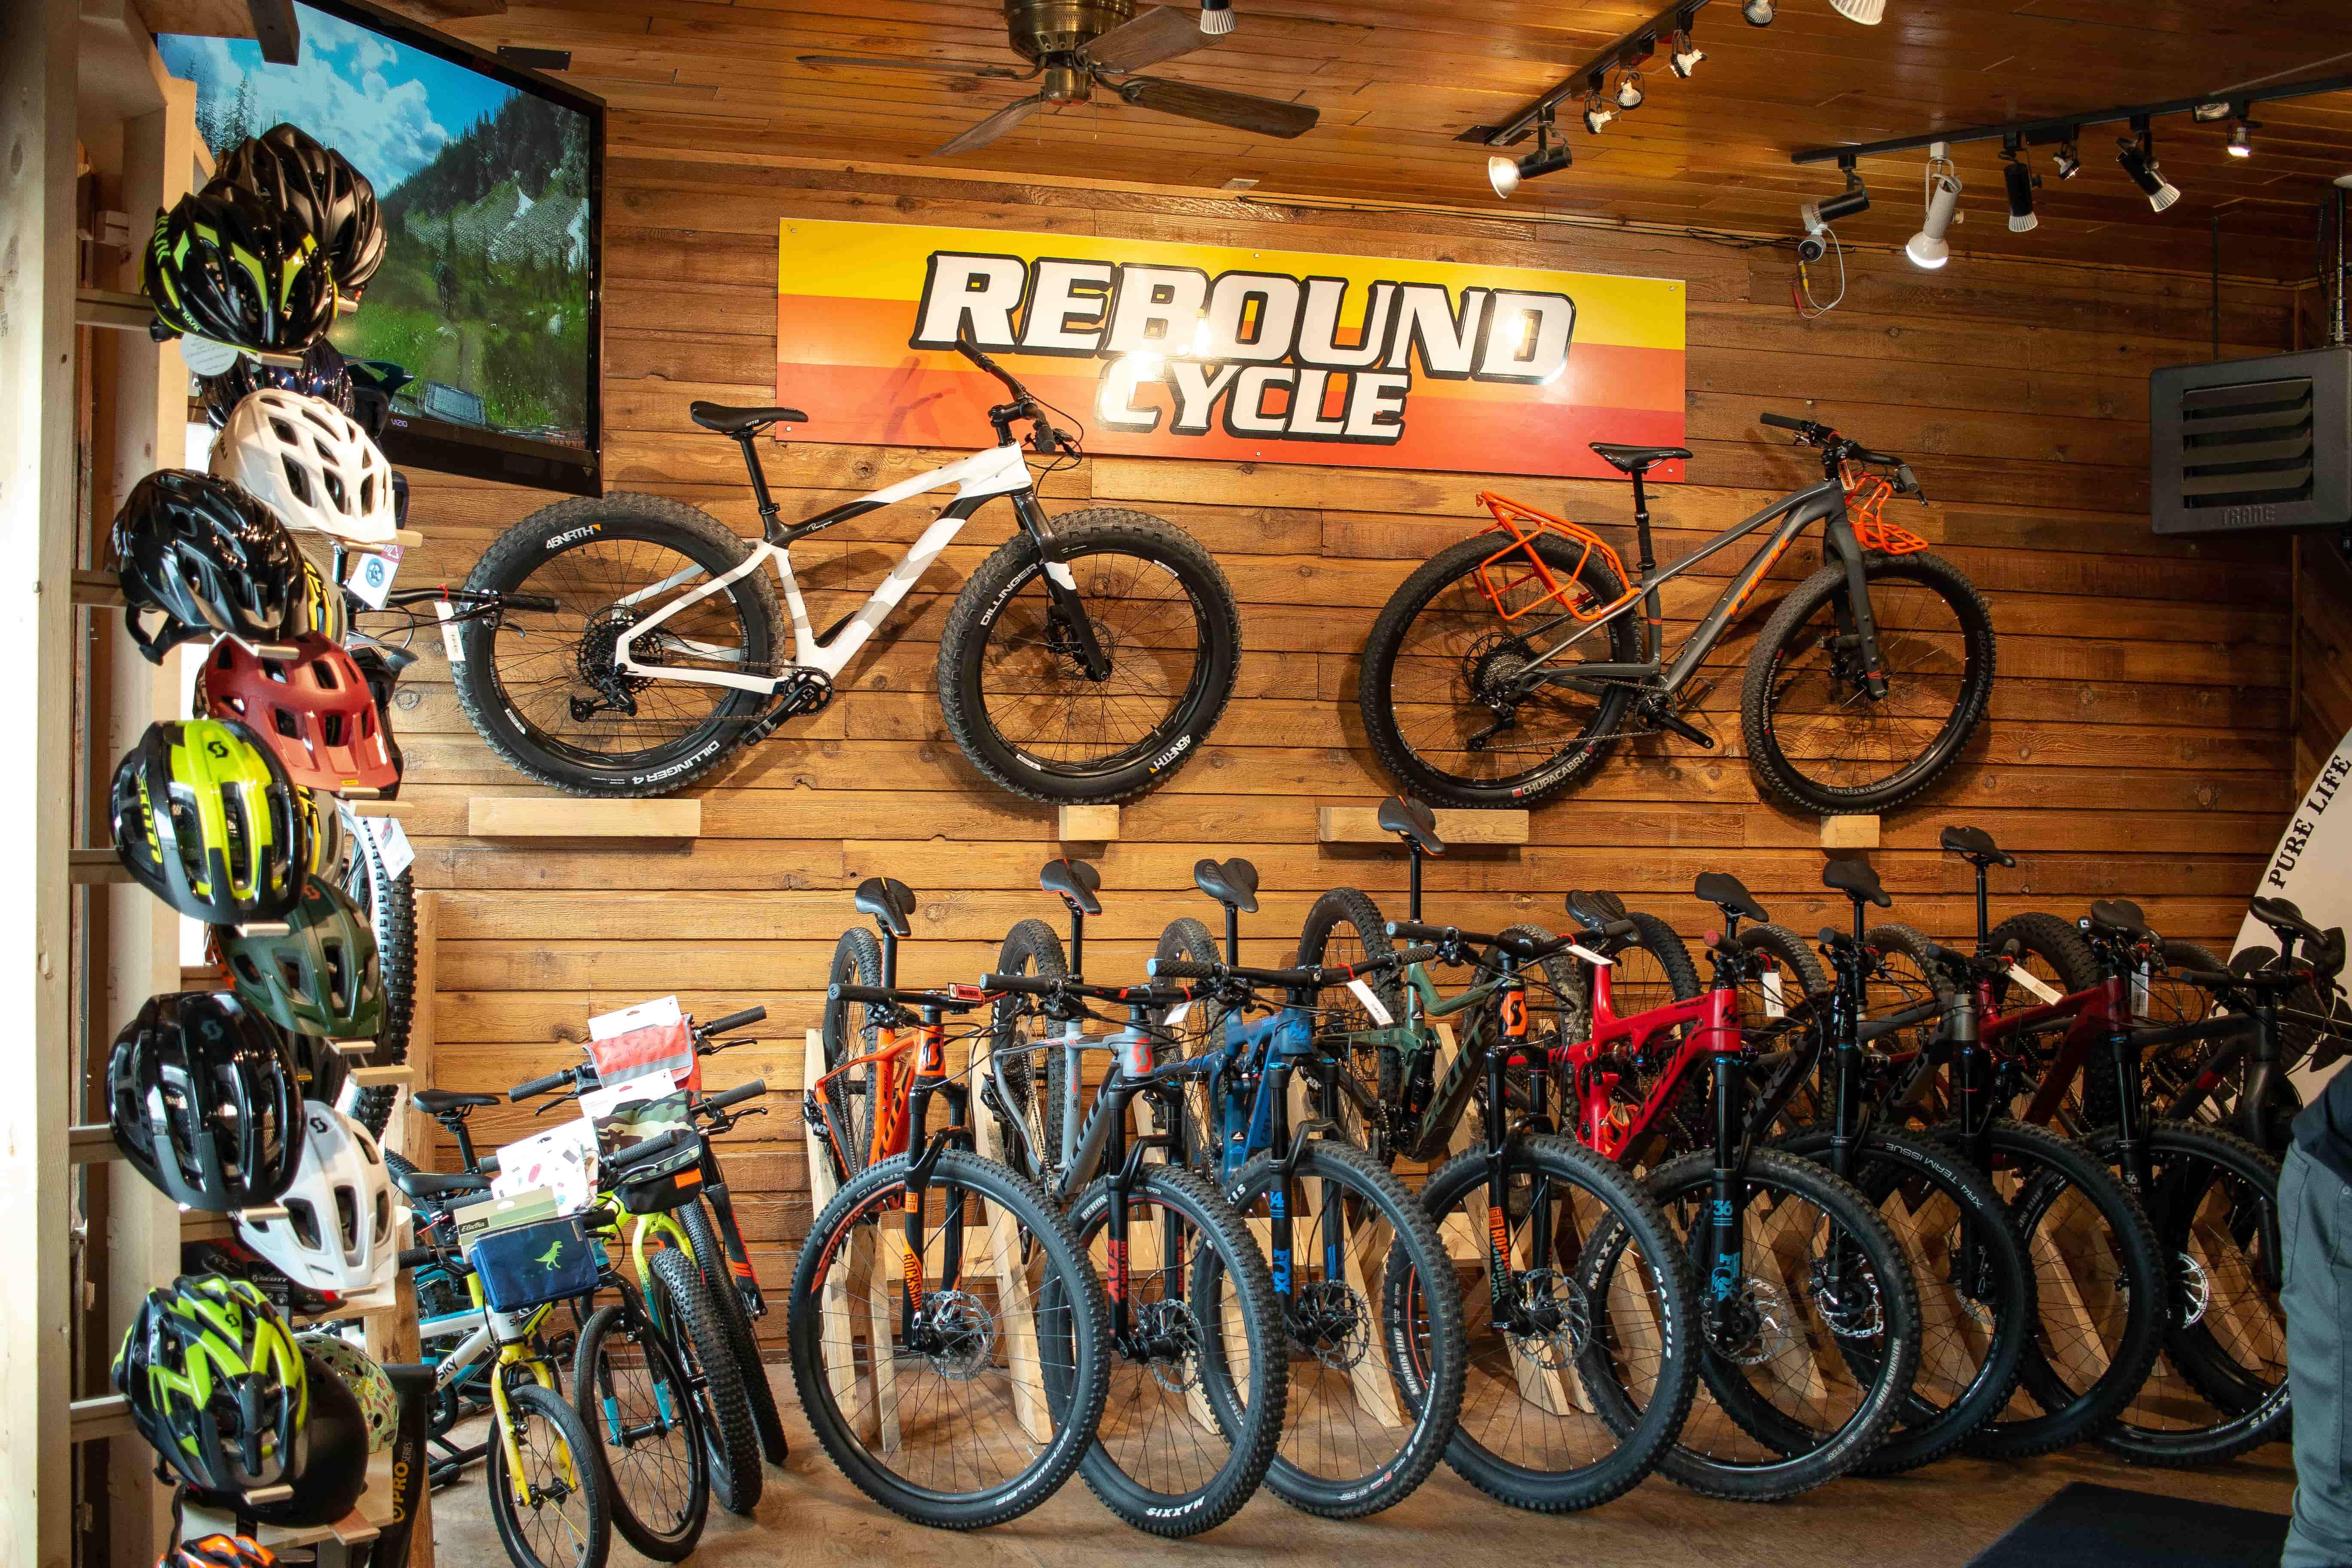 Rebound Cycle shop